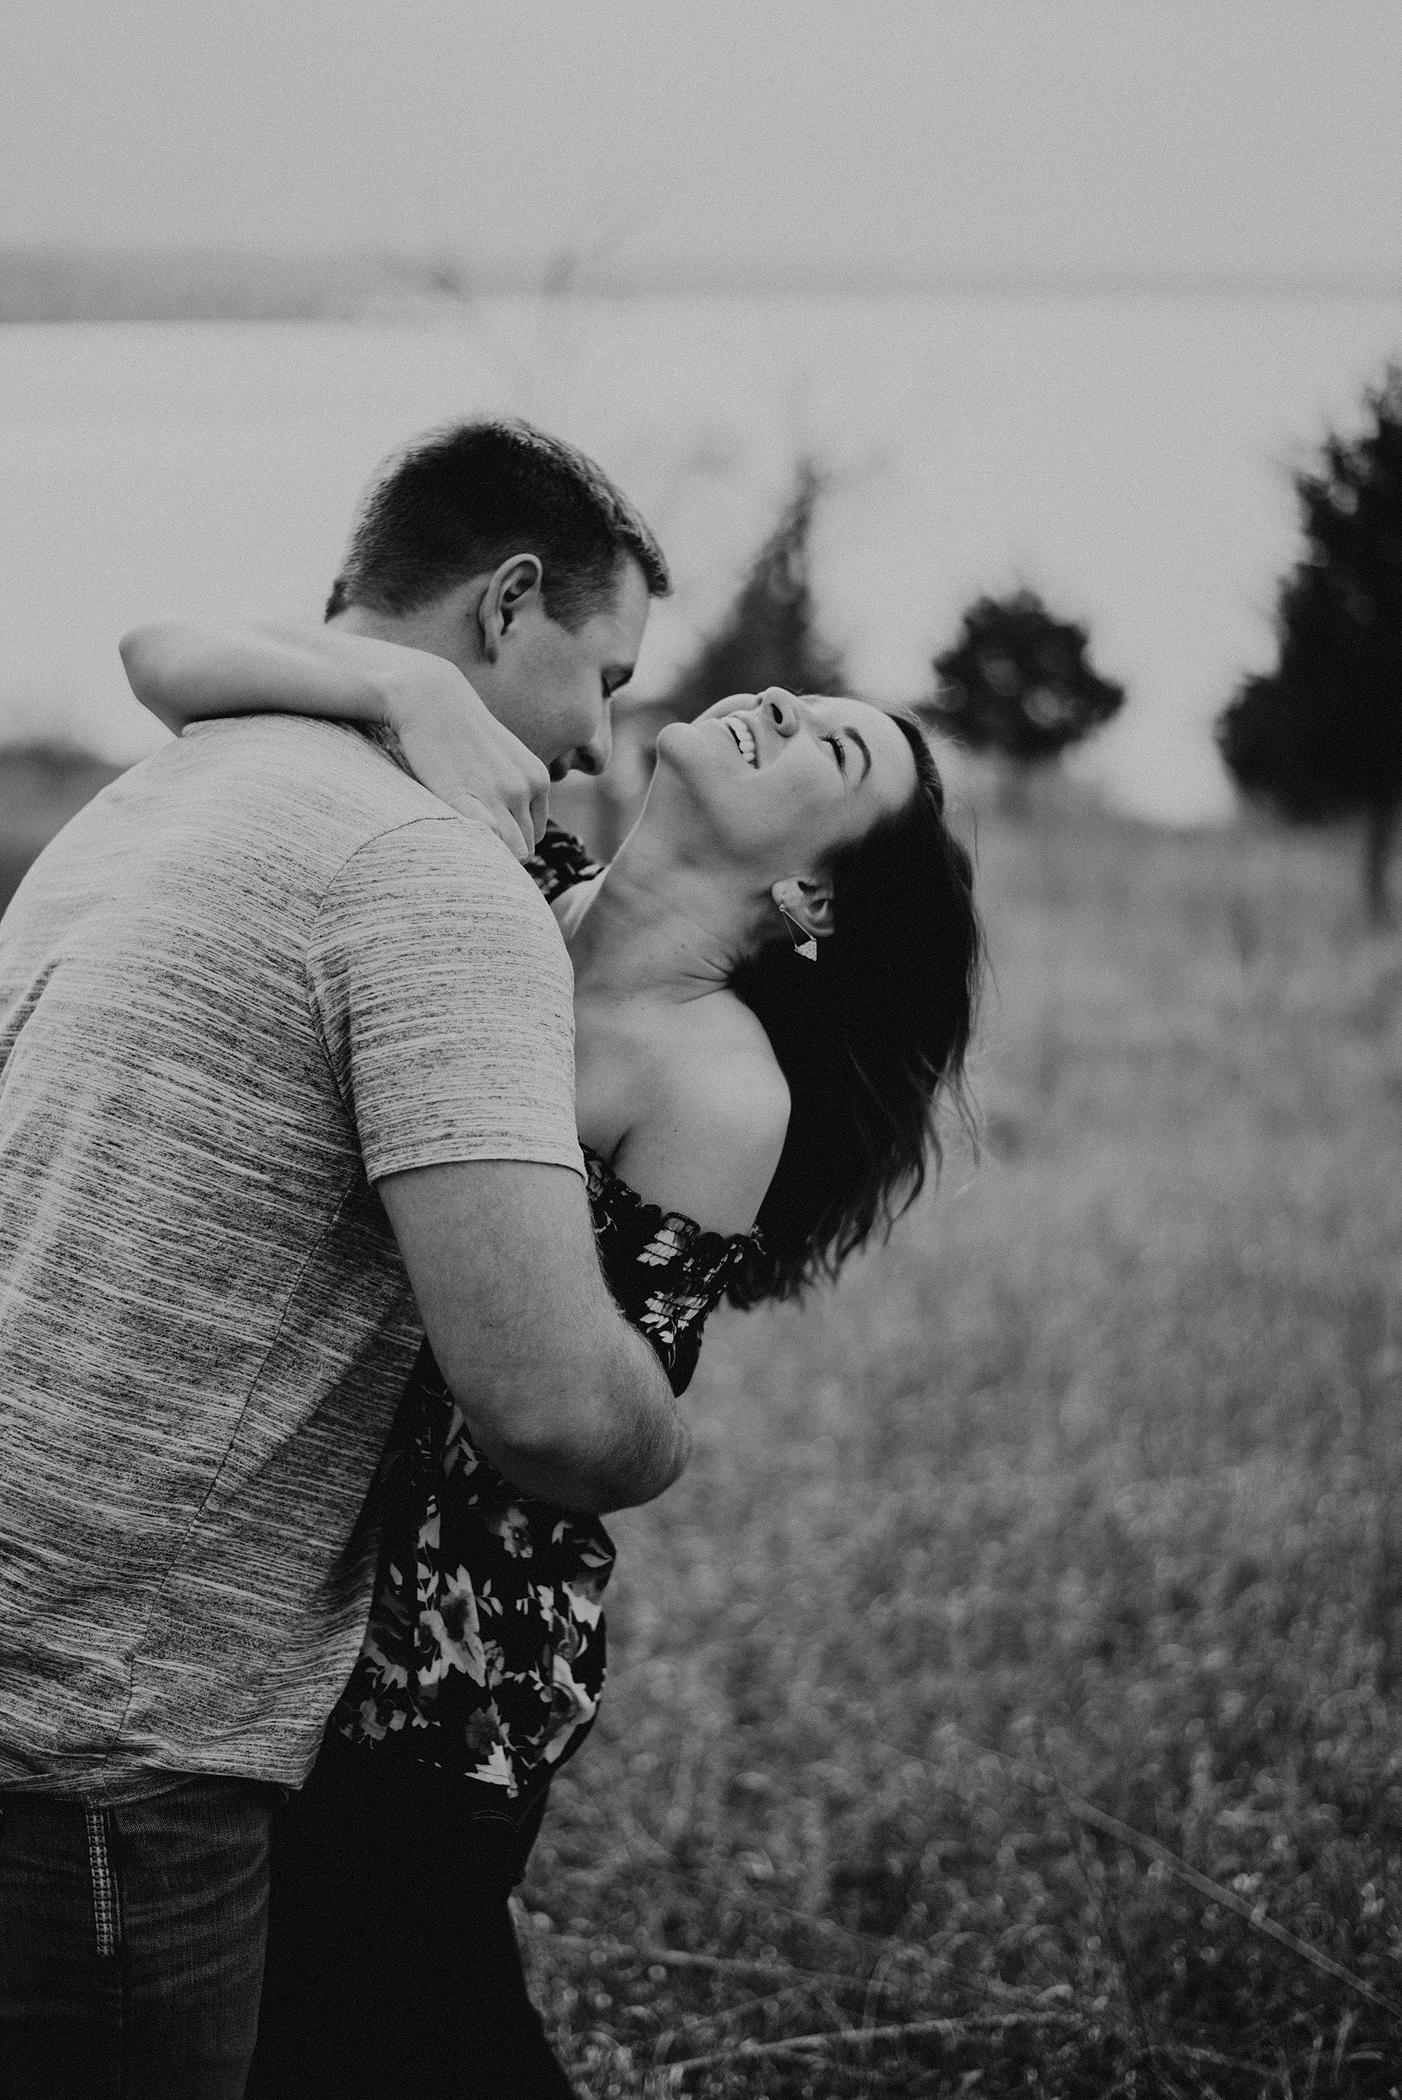 kaylie-sirek-nebraska-wedding-engagement-photographer-photography-grand-island-kearney-hastings-lincoln-36.png